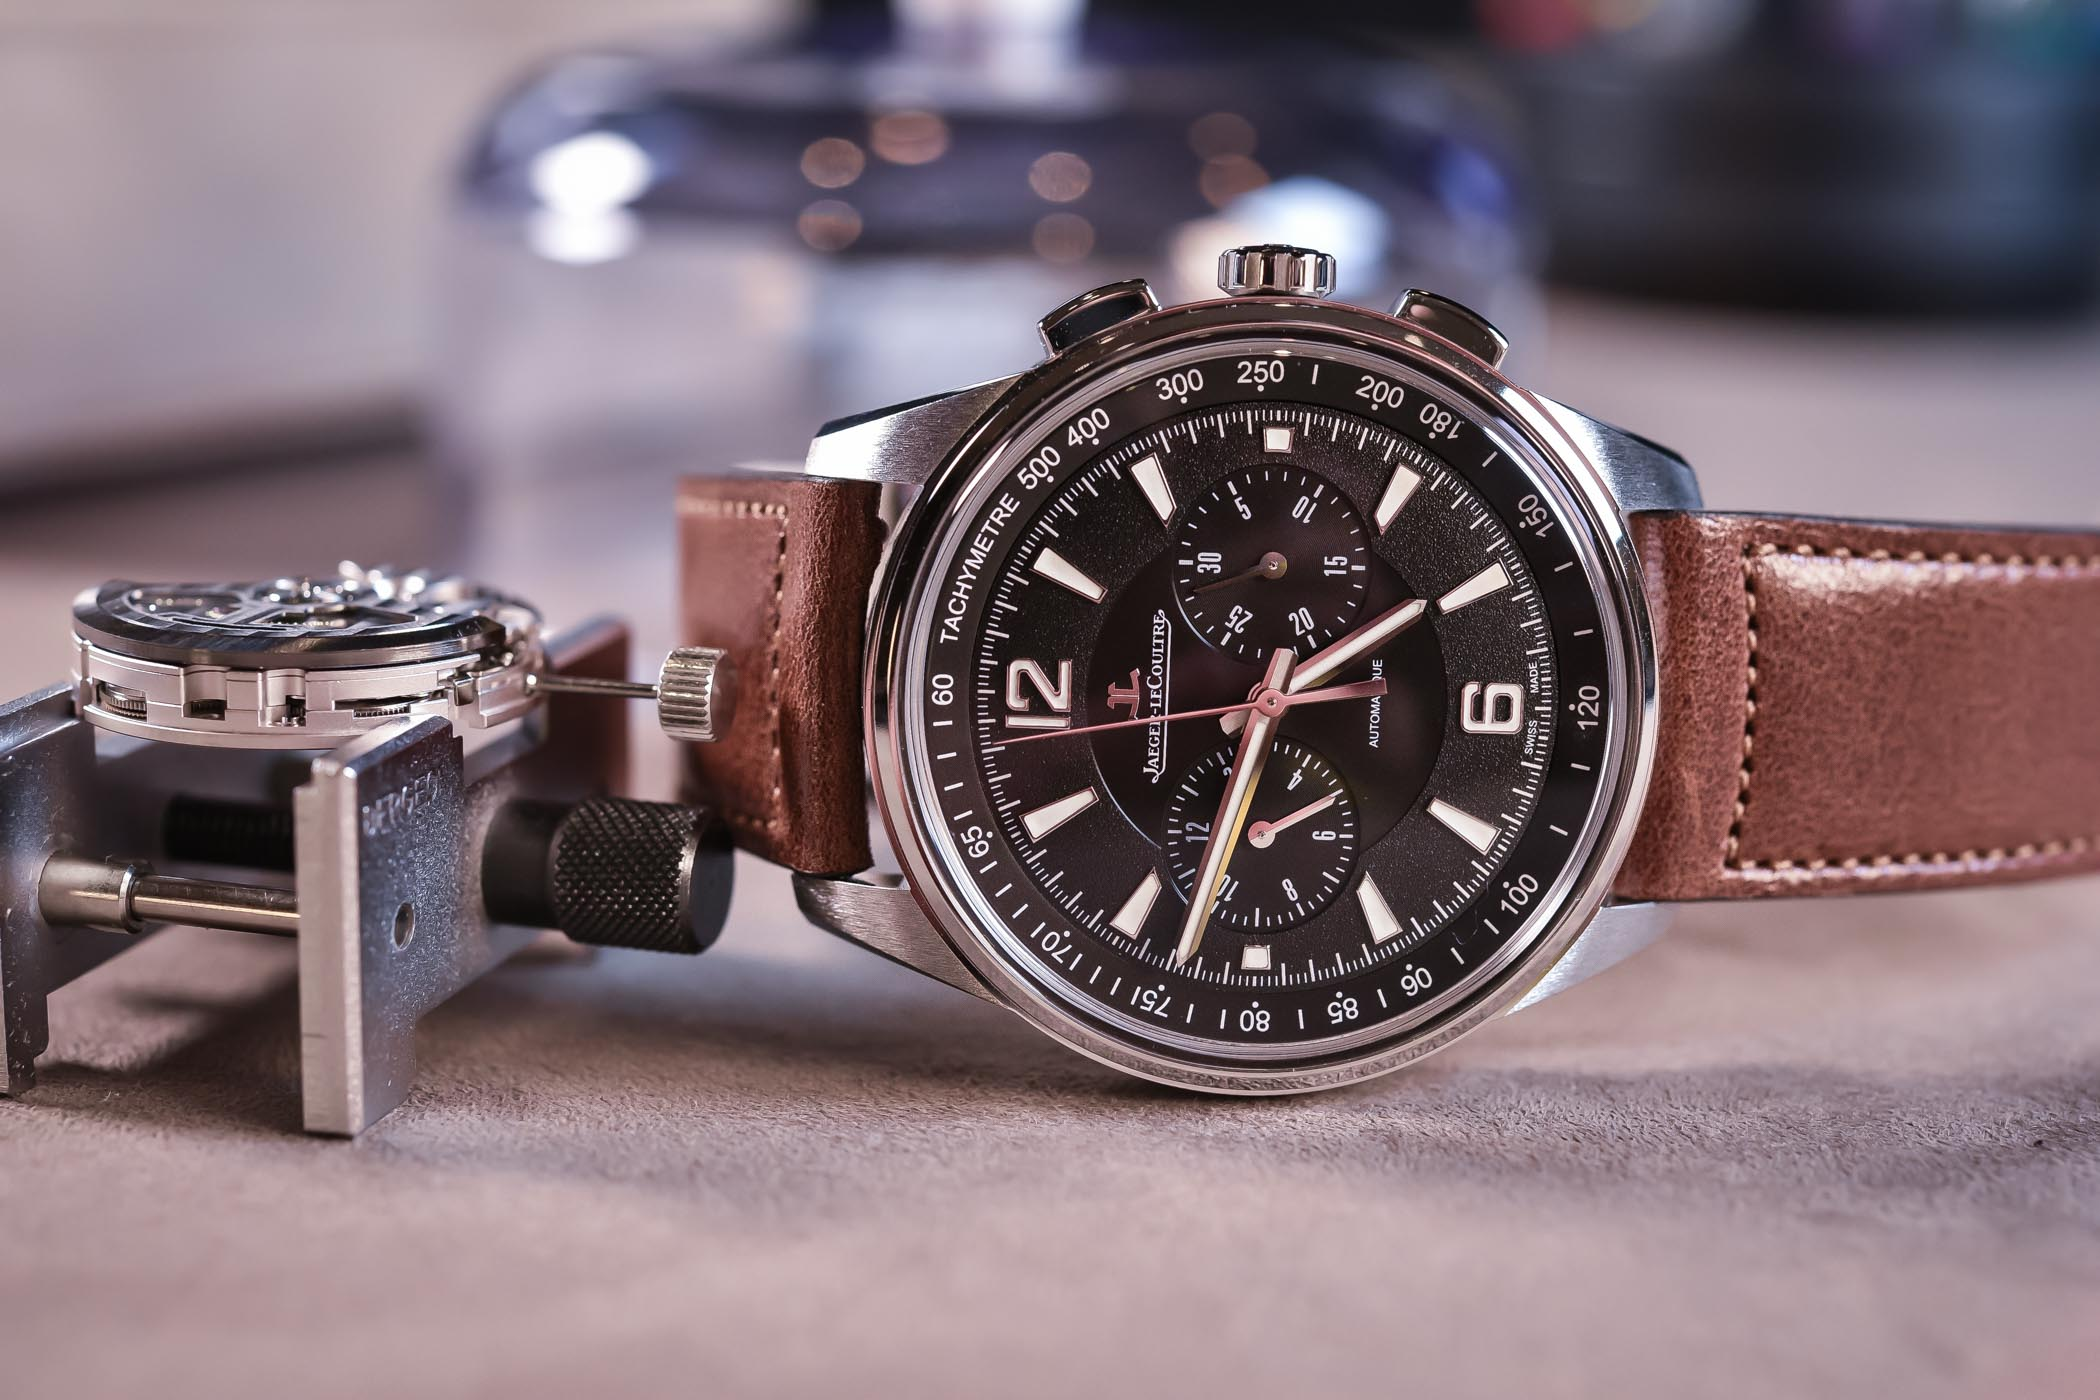 Jaeger-LeCoultre Polaris Chronograph Black dial 9028471